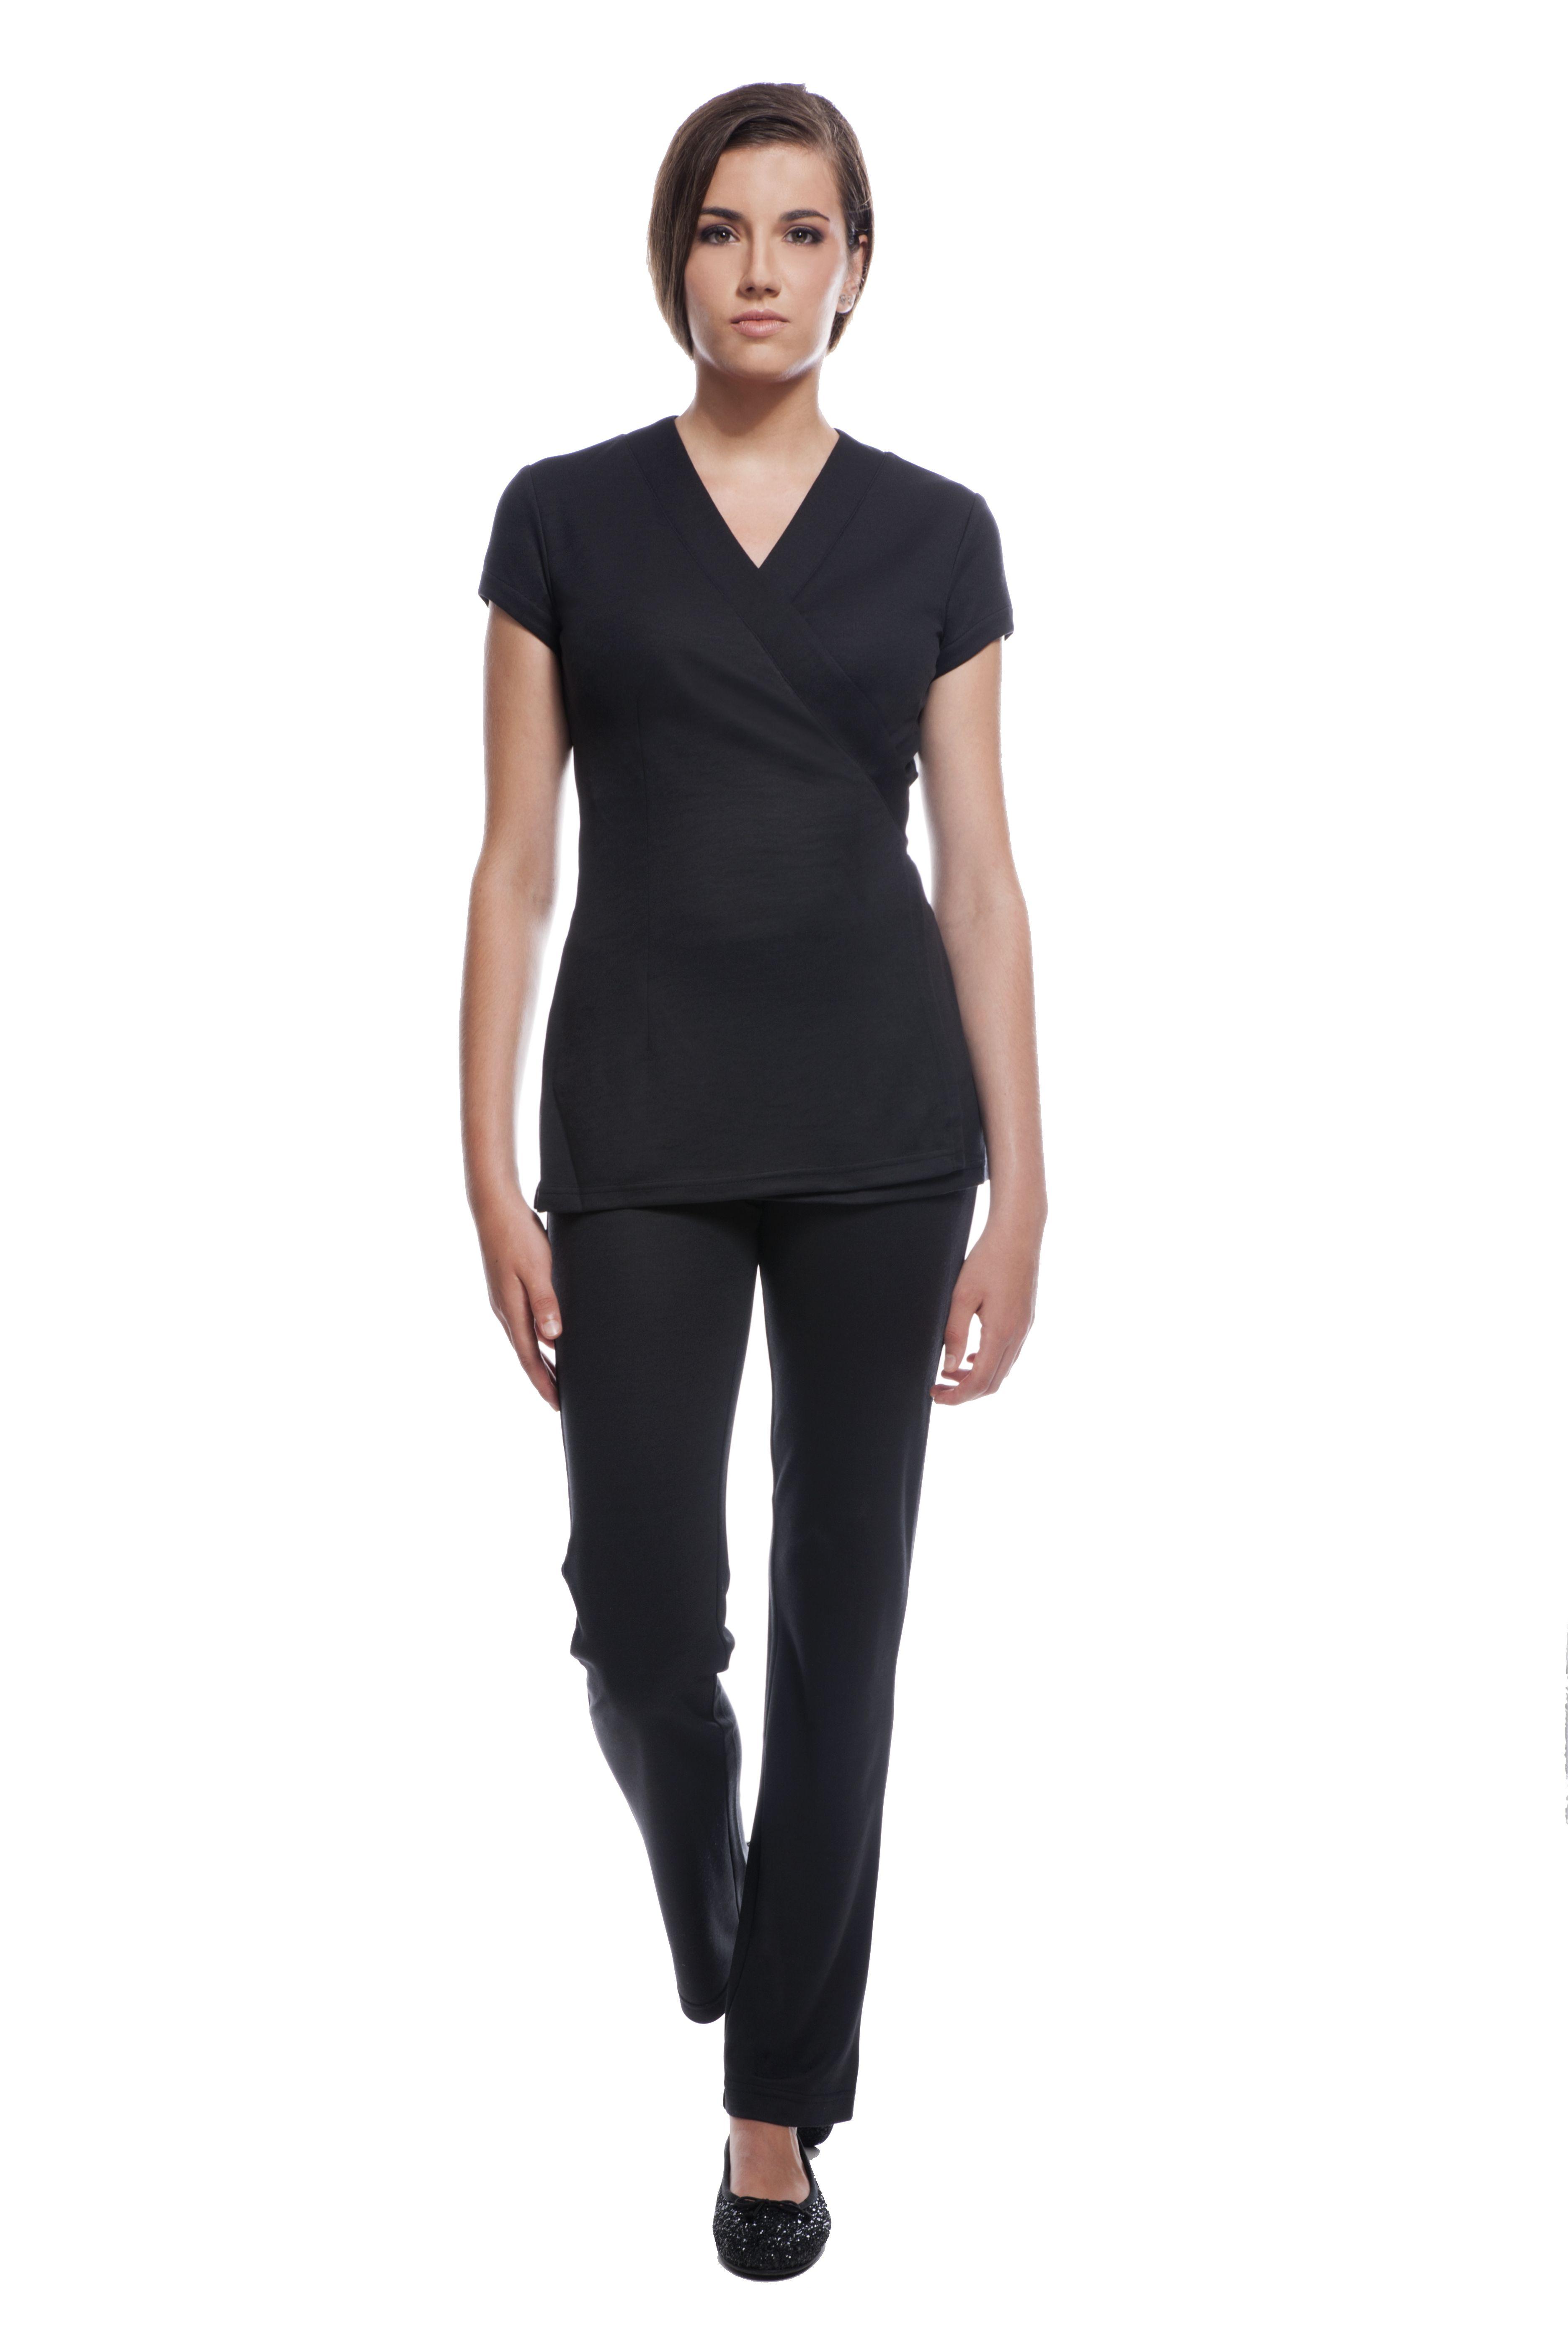 Stylemonarchy spa uniform sao paulo tunic cancun pants for Spa uniform images